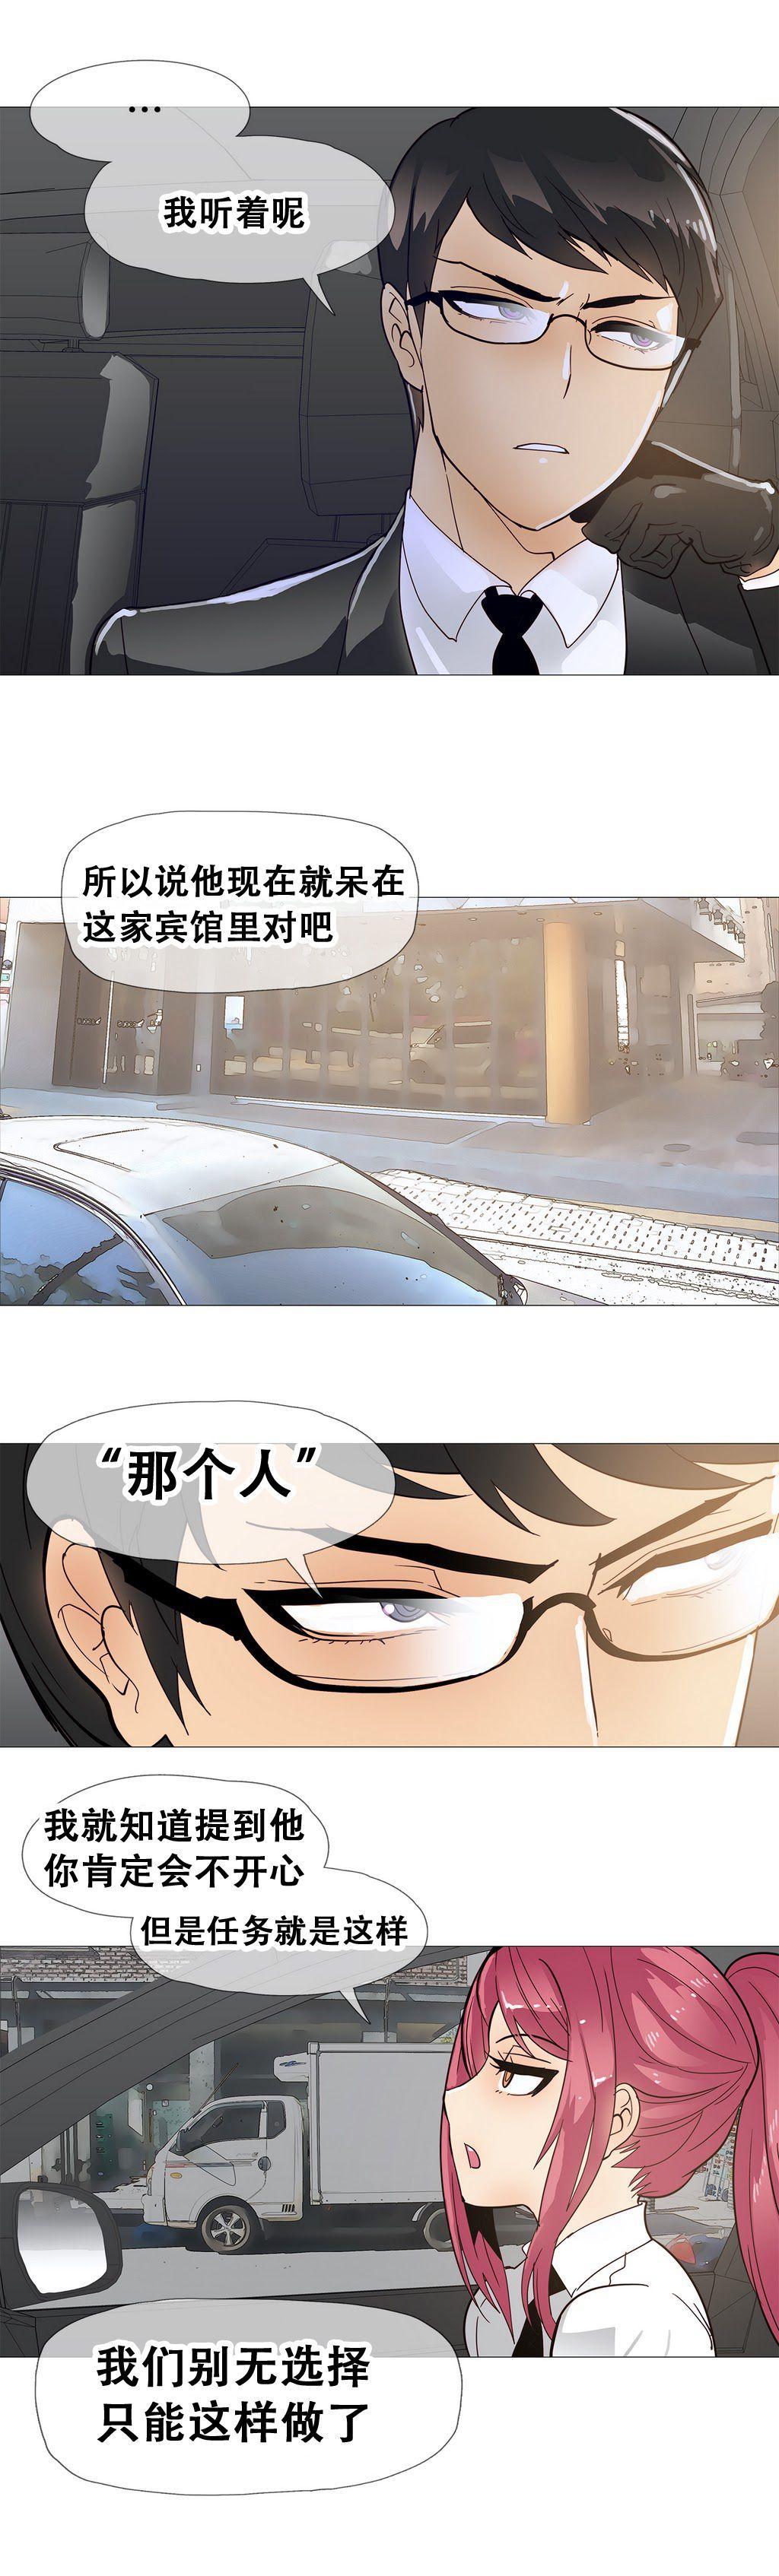 HouseHold Affairs 【卞赤鲤个人汉化】1~33话(持续更新中) 298